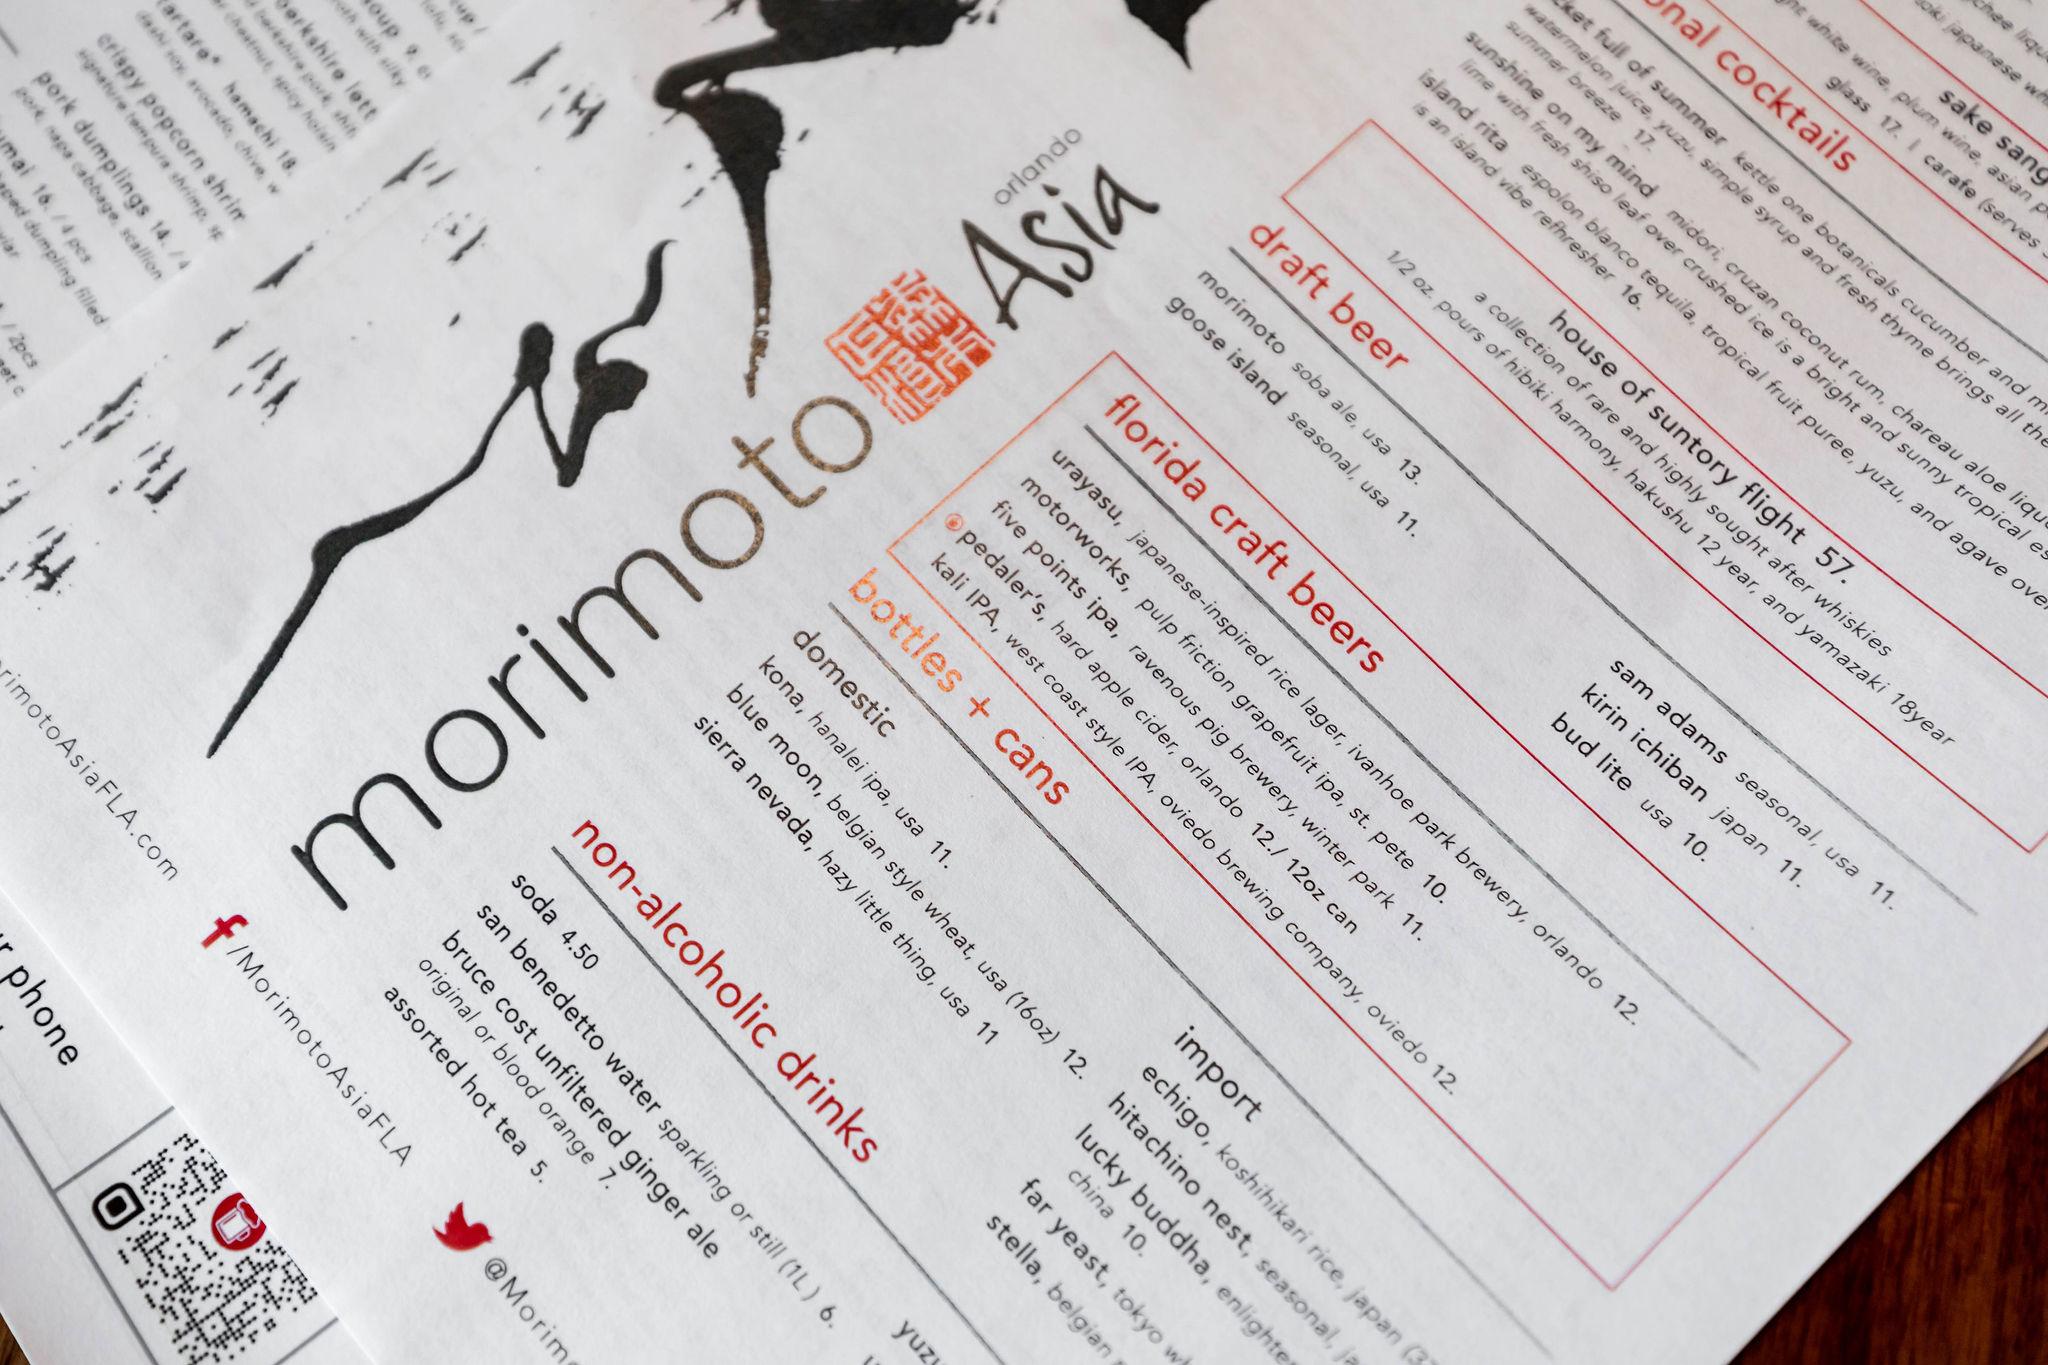 Morimoto Asia Restaurant at Disney Springs Walt Disney World by Annie Fairfax